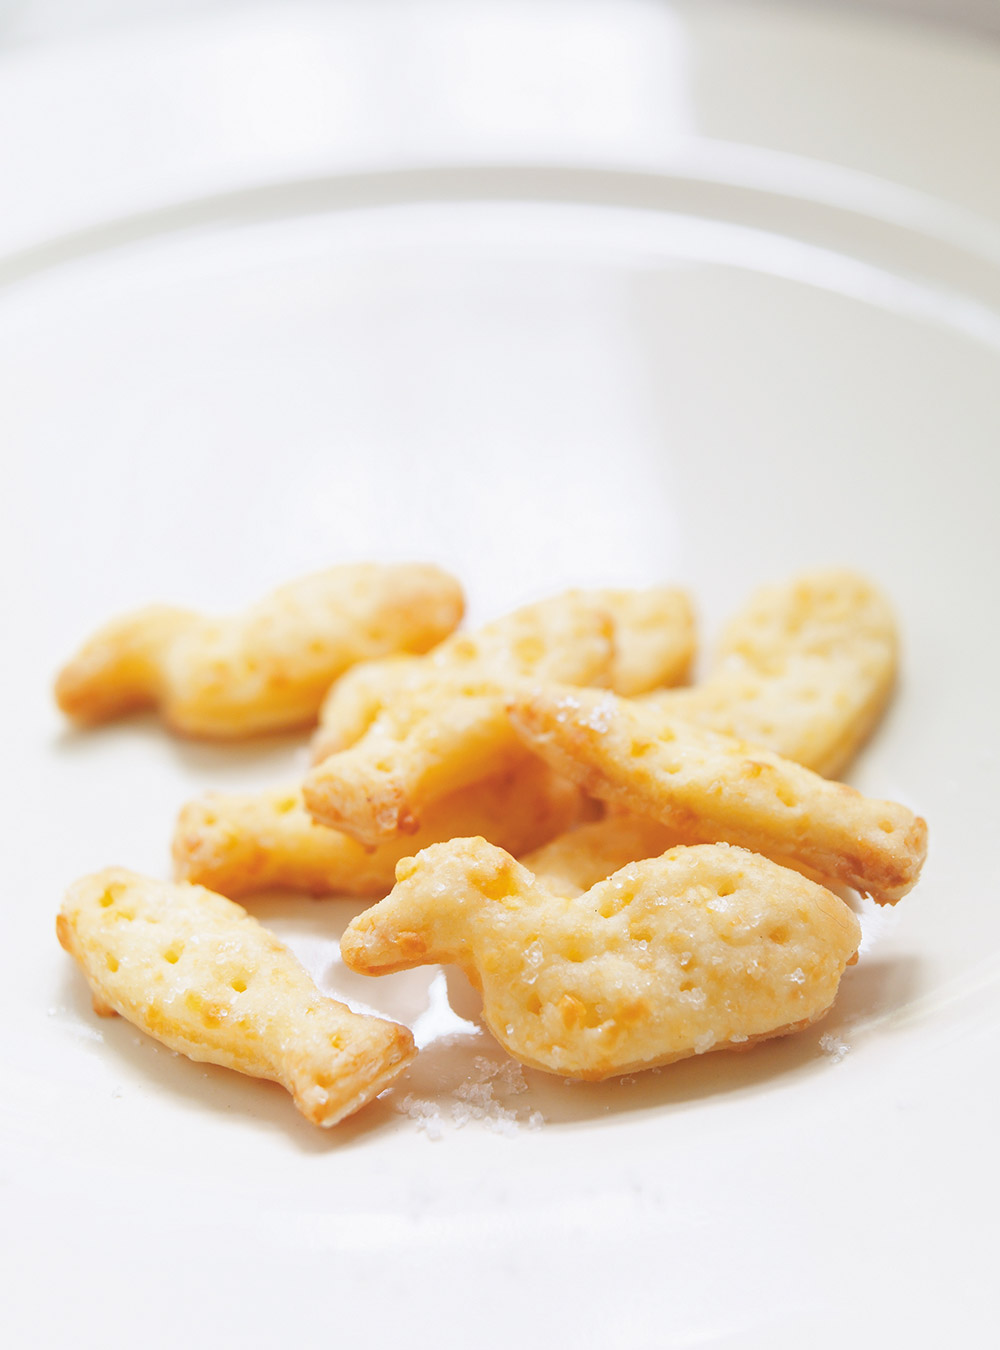 Craquelins au fromage type goldfish au cheddar | ricardo